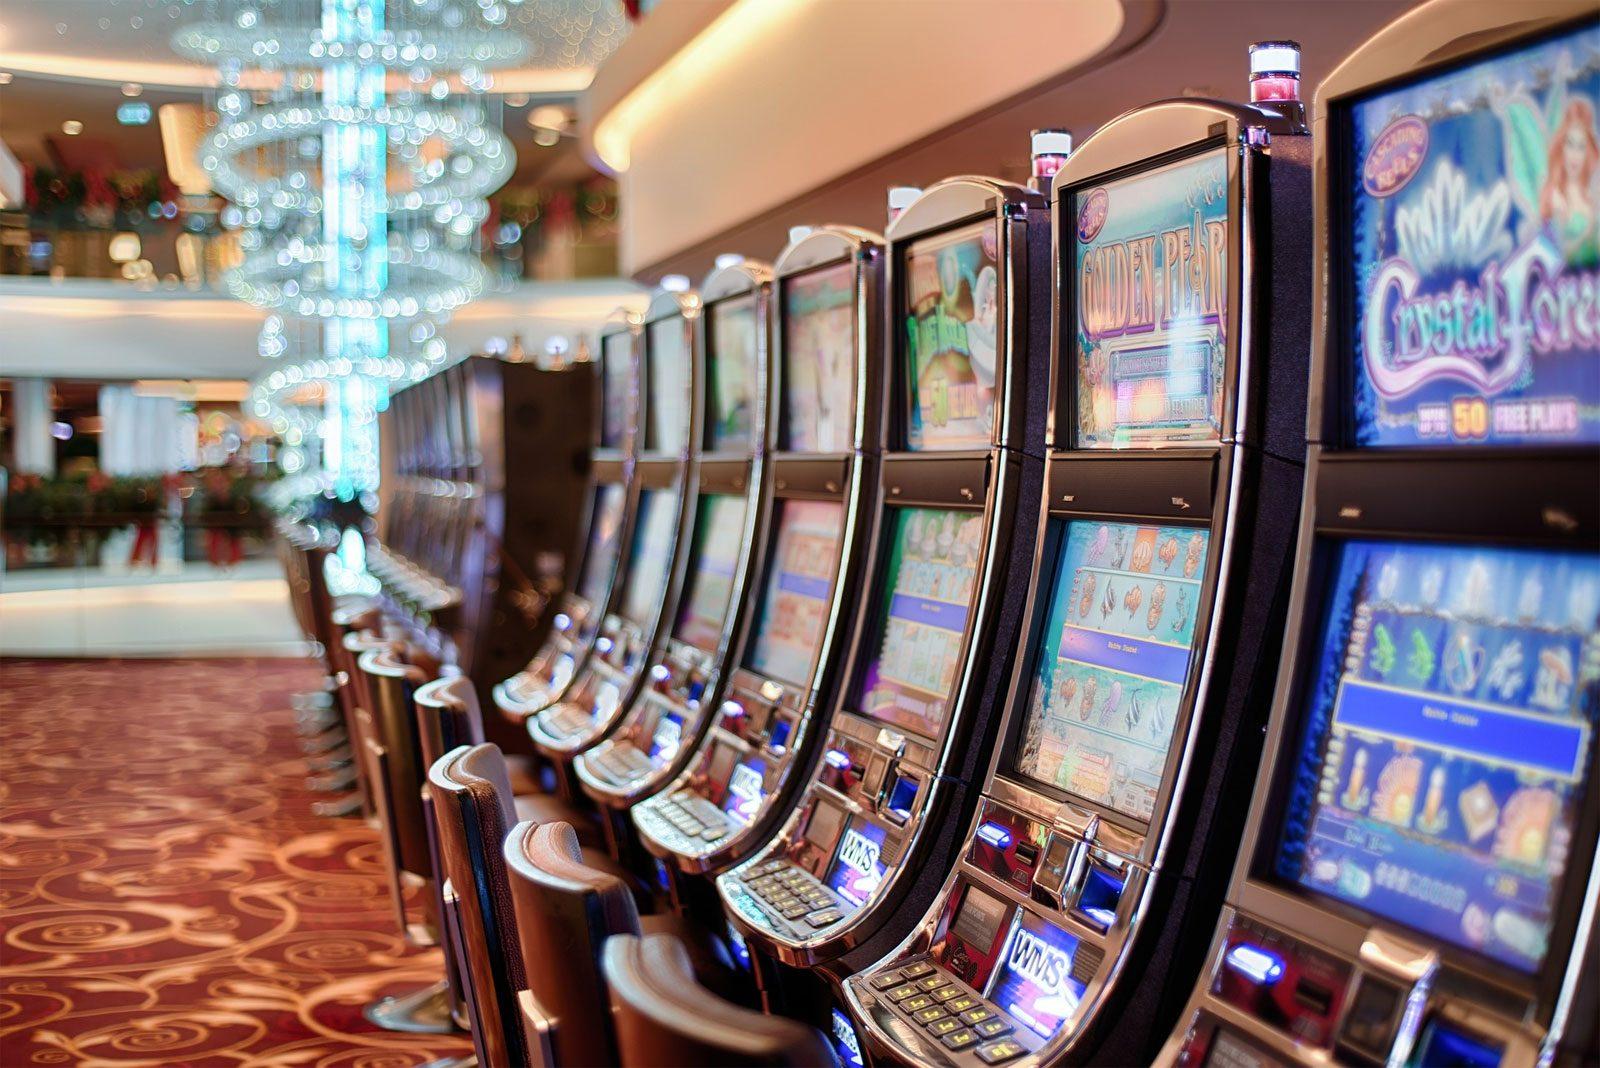 Casino a metz 5 dragons online slot machine